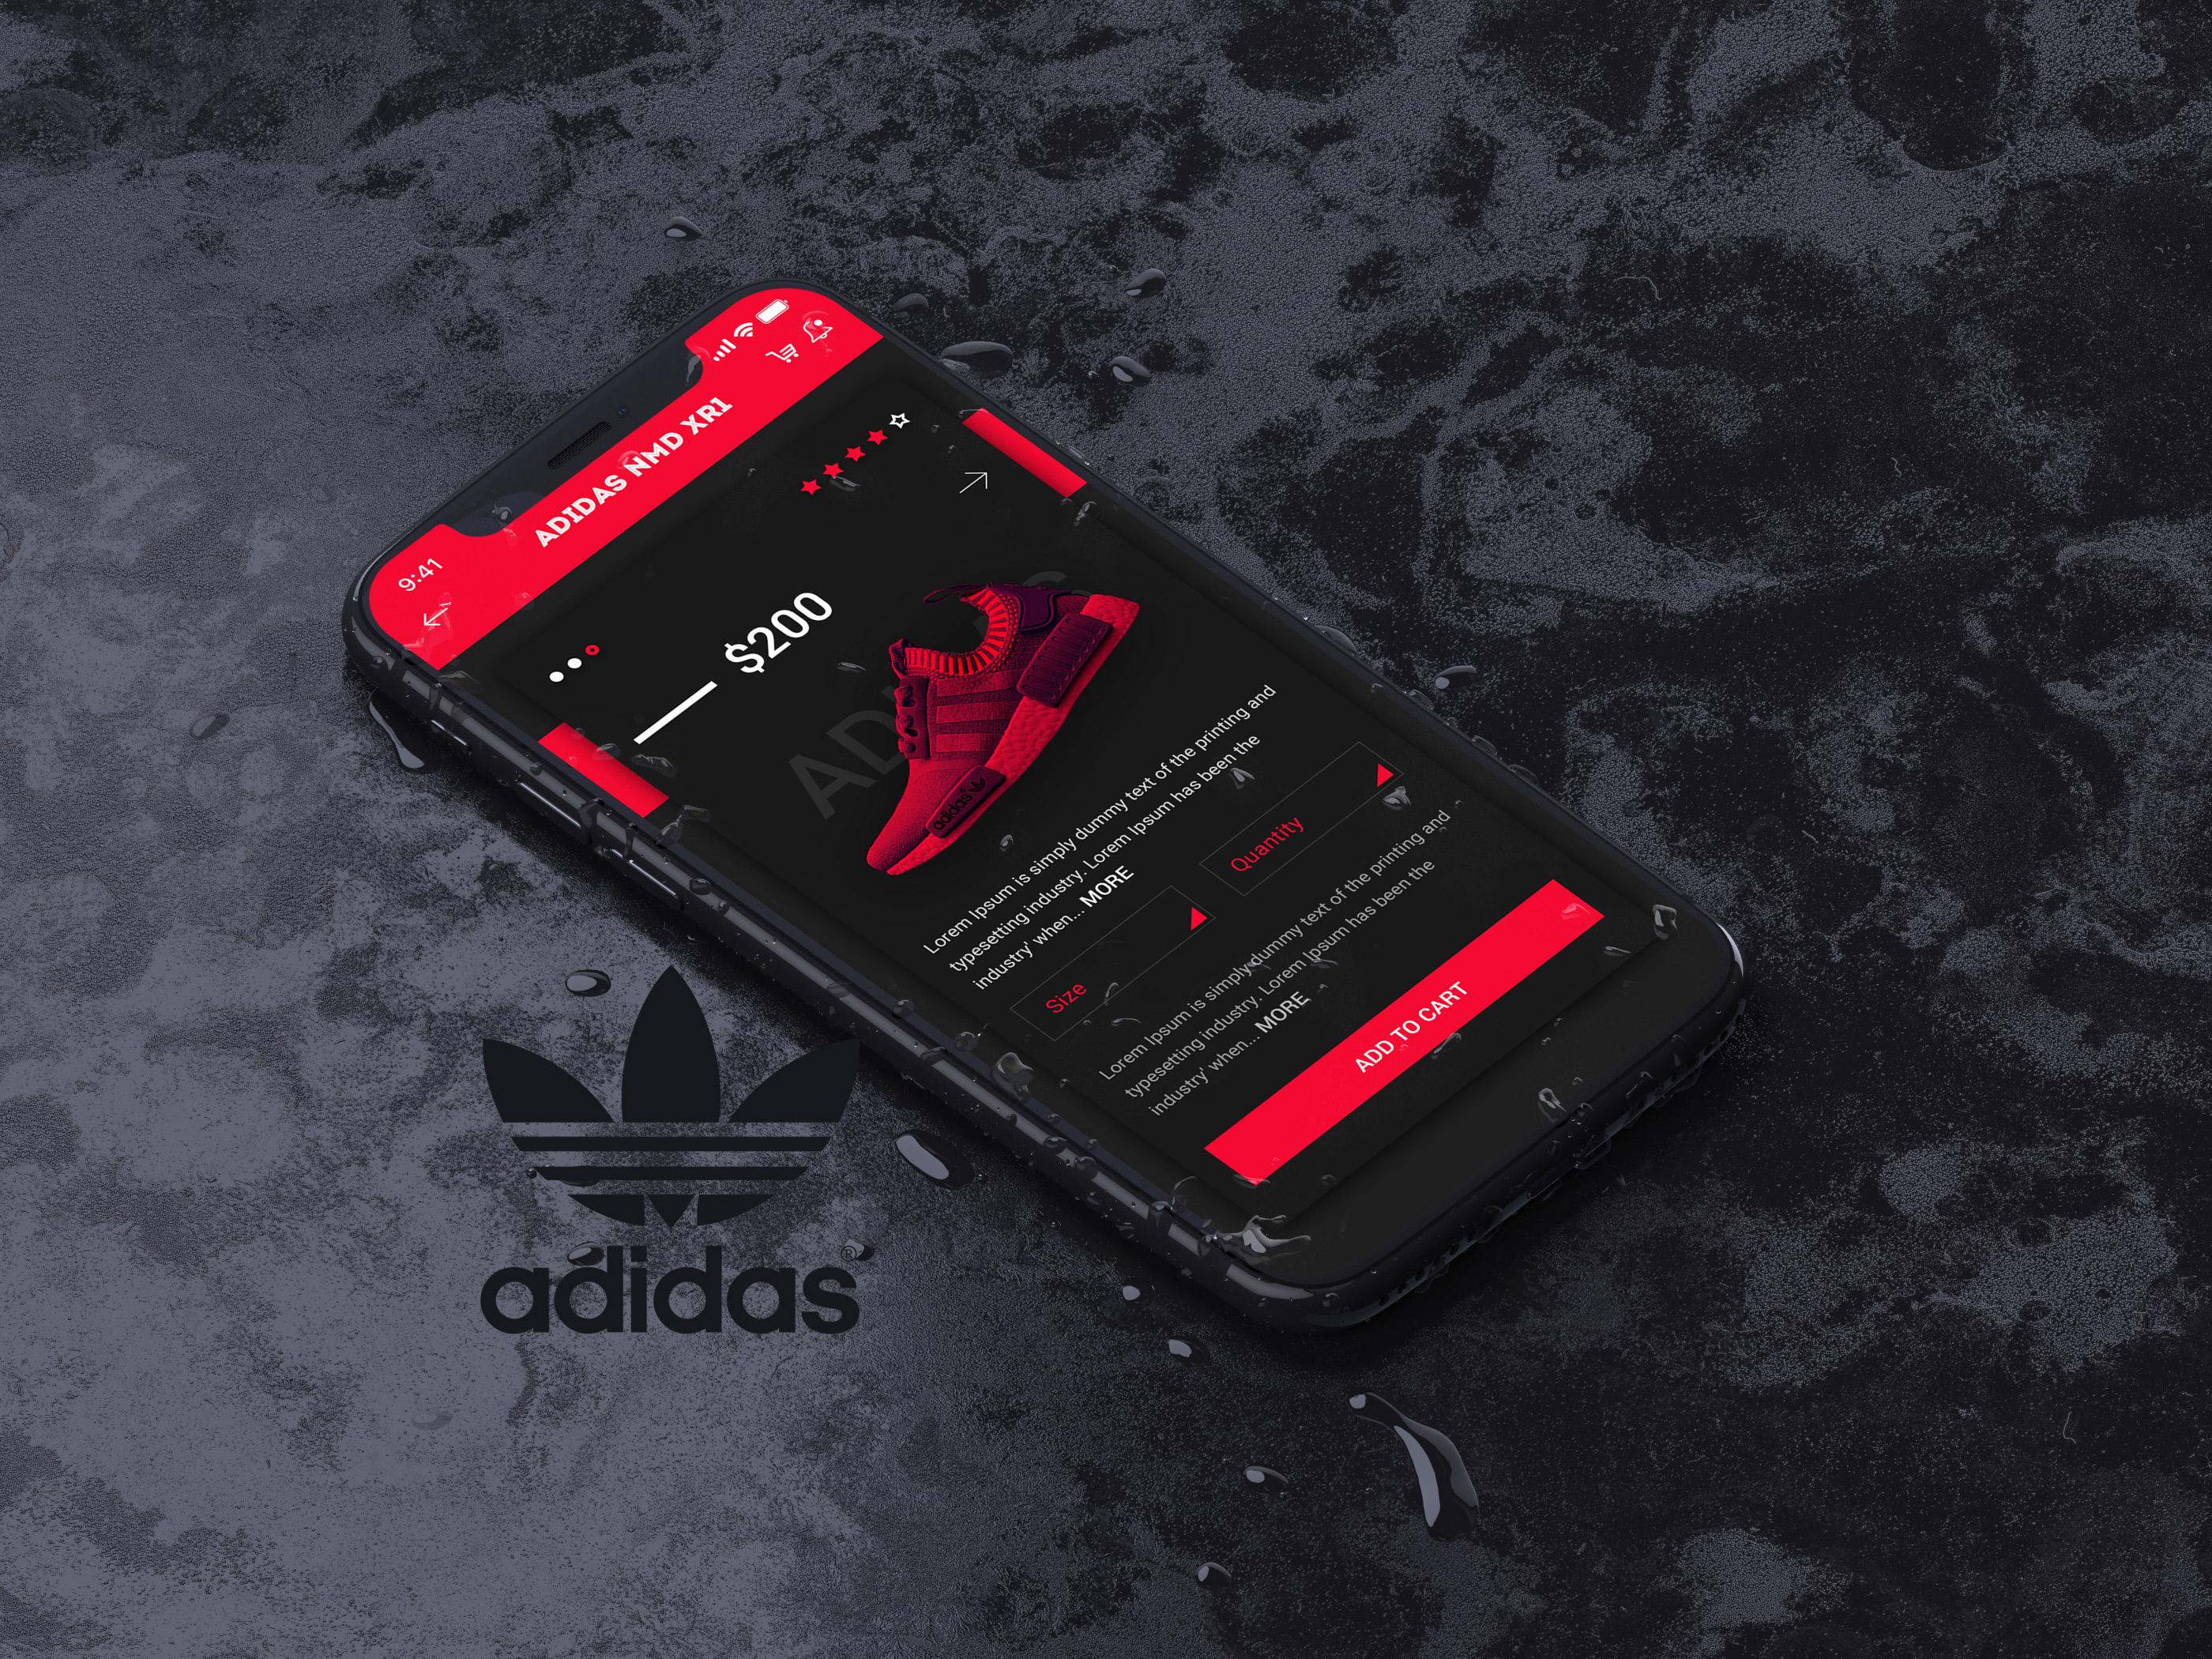 Shopping-ui-adidas03